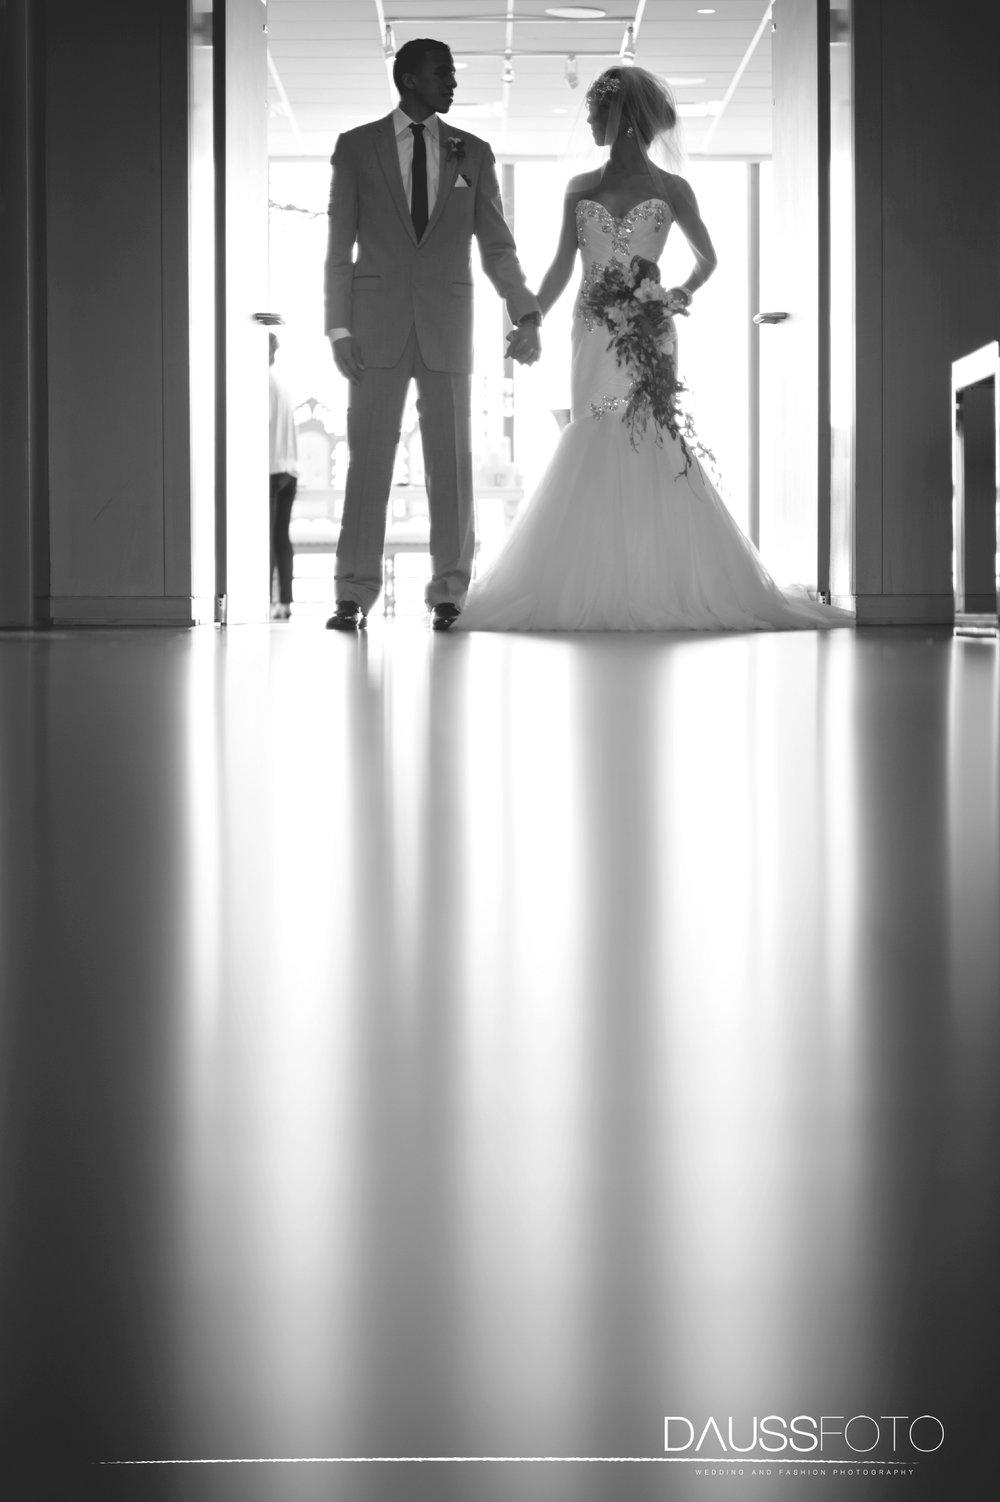 DaussFOTO_20150721_032_Indiana Wedding Photographer.jpg